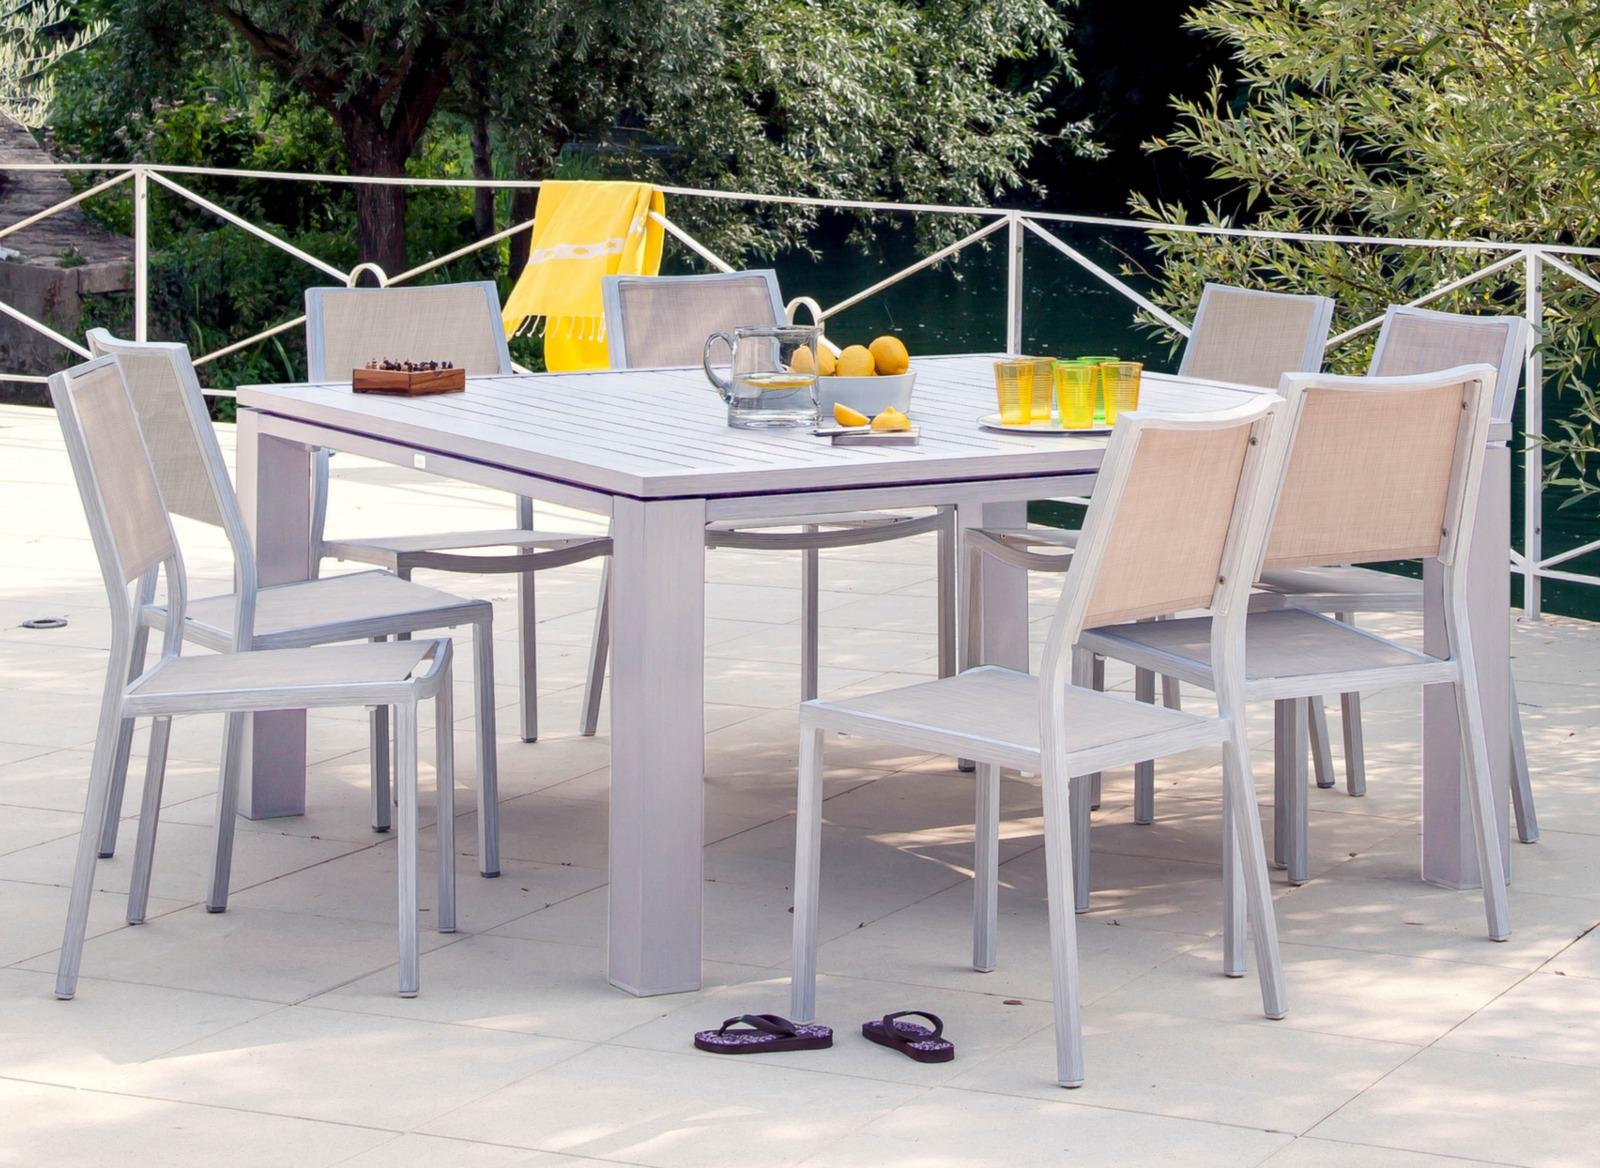 Table de jardin carrée Fiero 160cm - Mobilier de jardin - Proloisirs